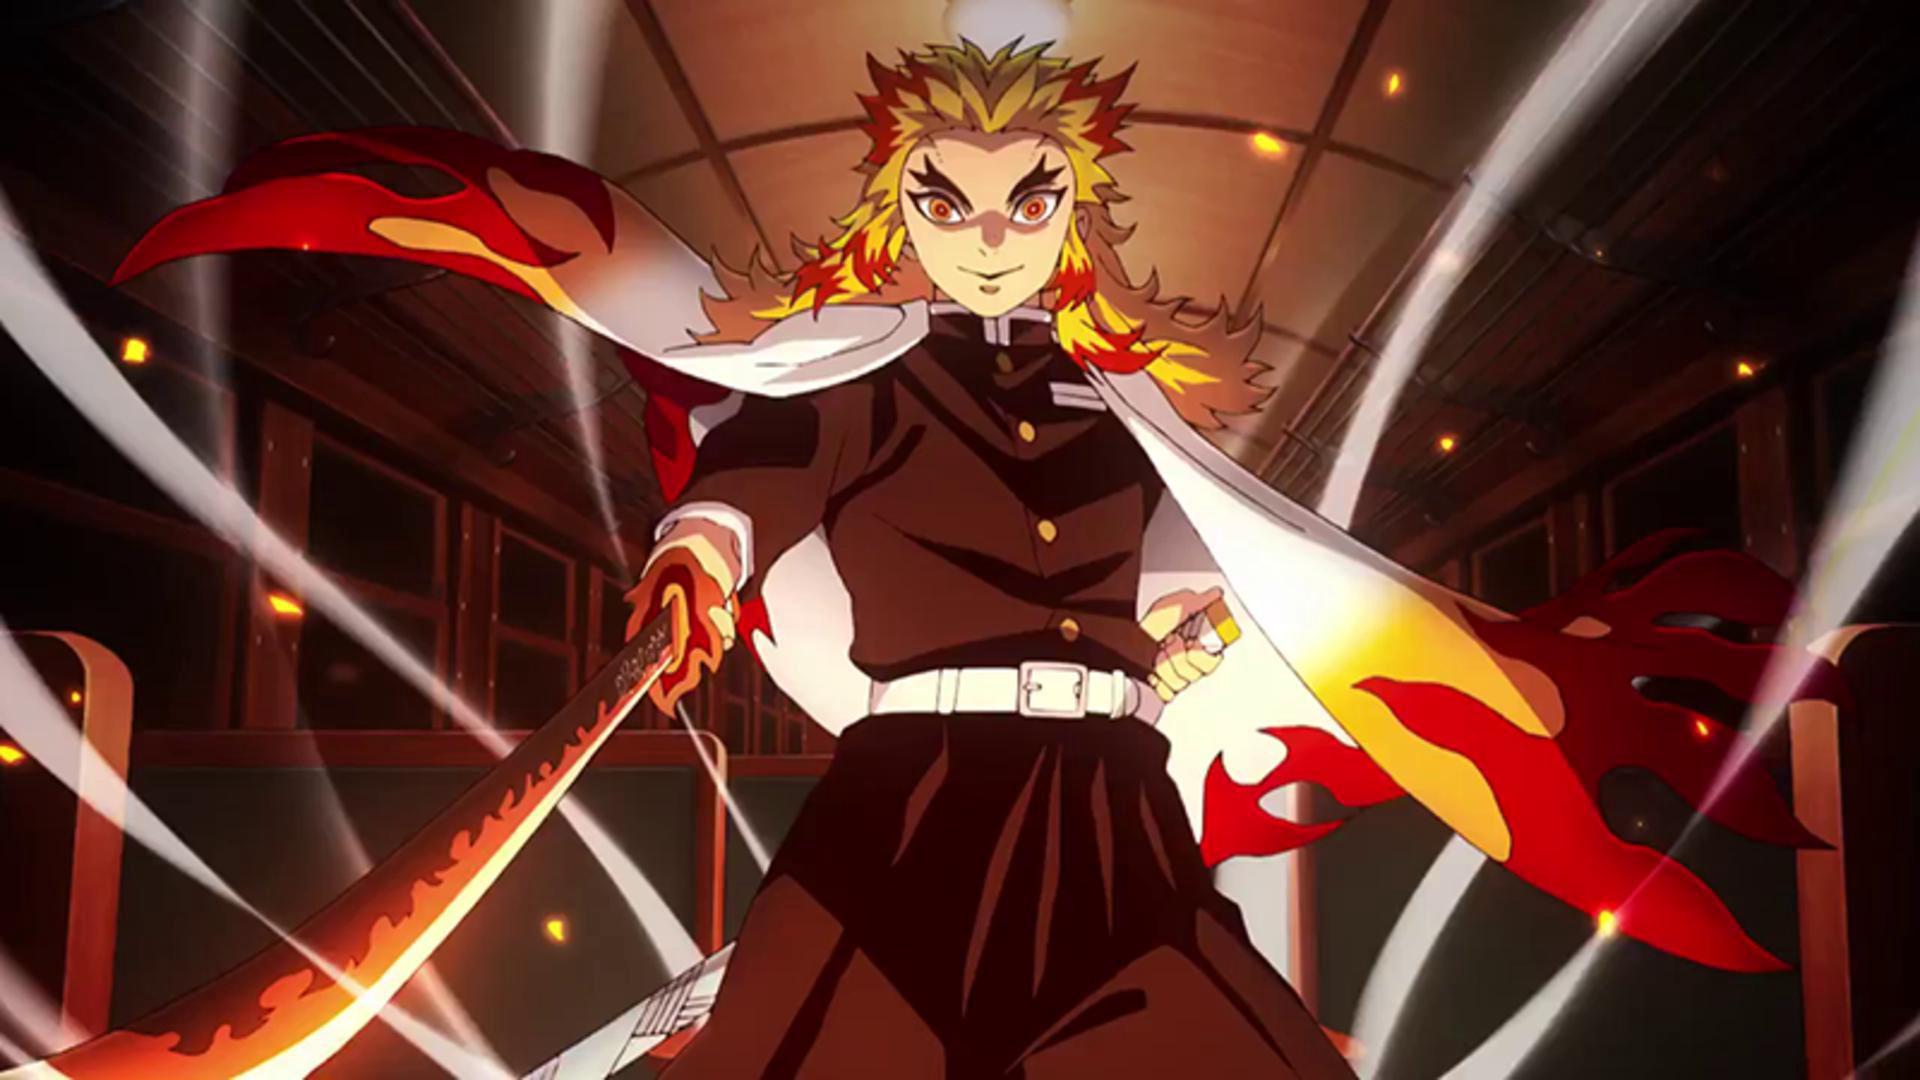 Demon Slayer Kimetsu No Yaiba The Movie Infinity Train Surpasses The 150 Million Mark Marketing Analysis